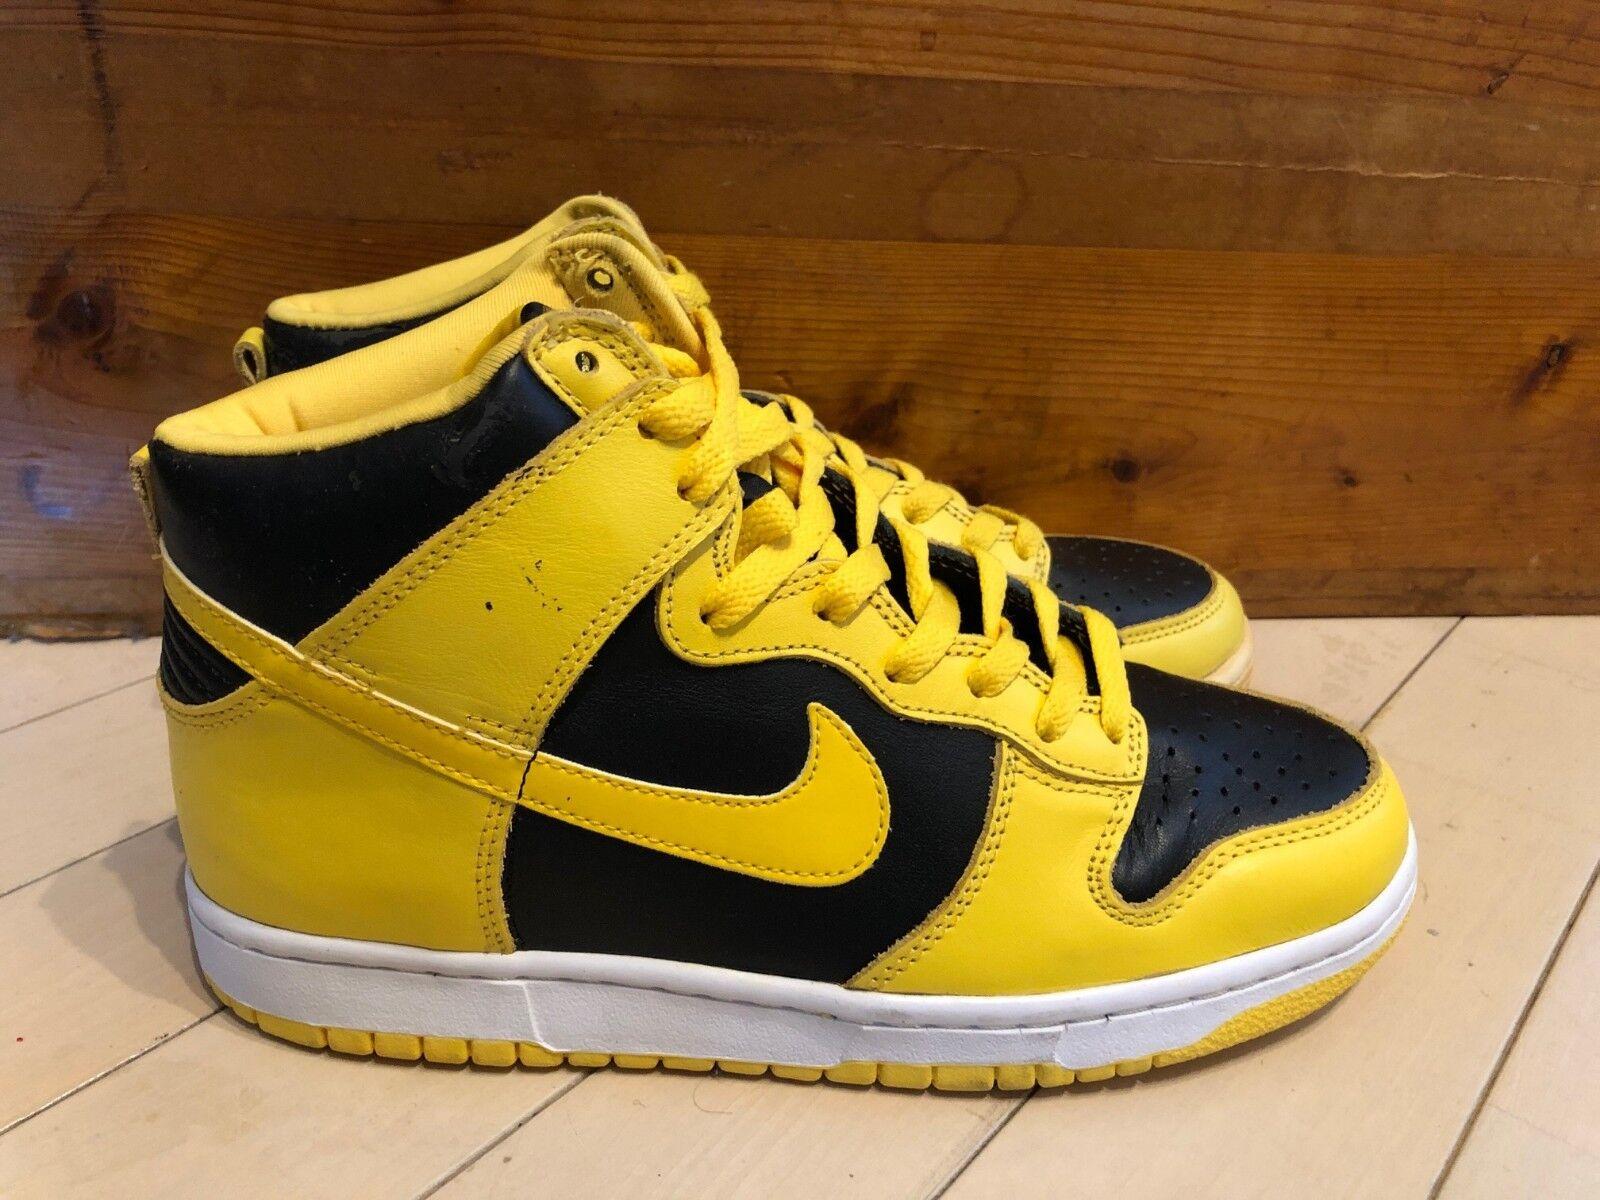 1999 Nike Dunk High LE goldenrod Yellow Black size 8